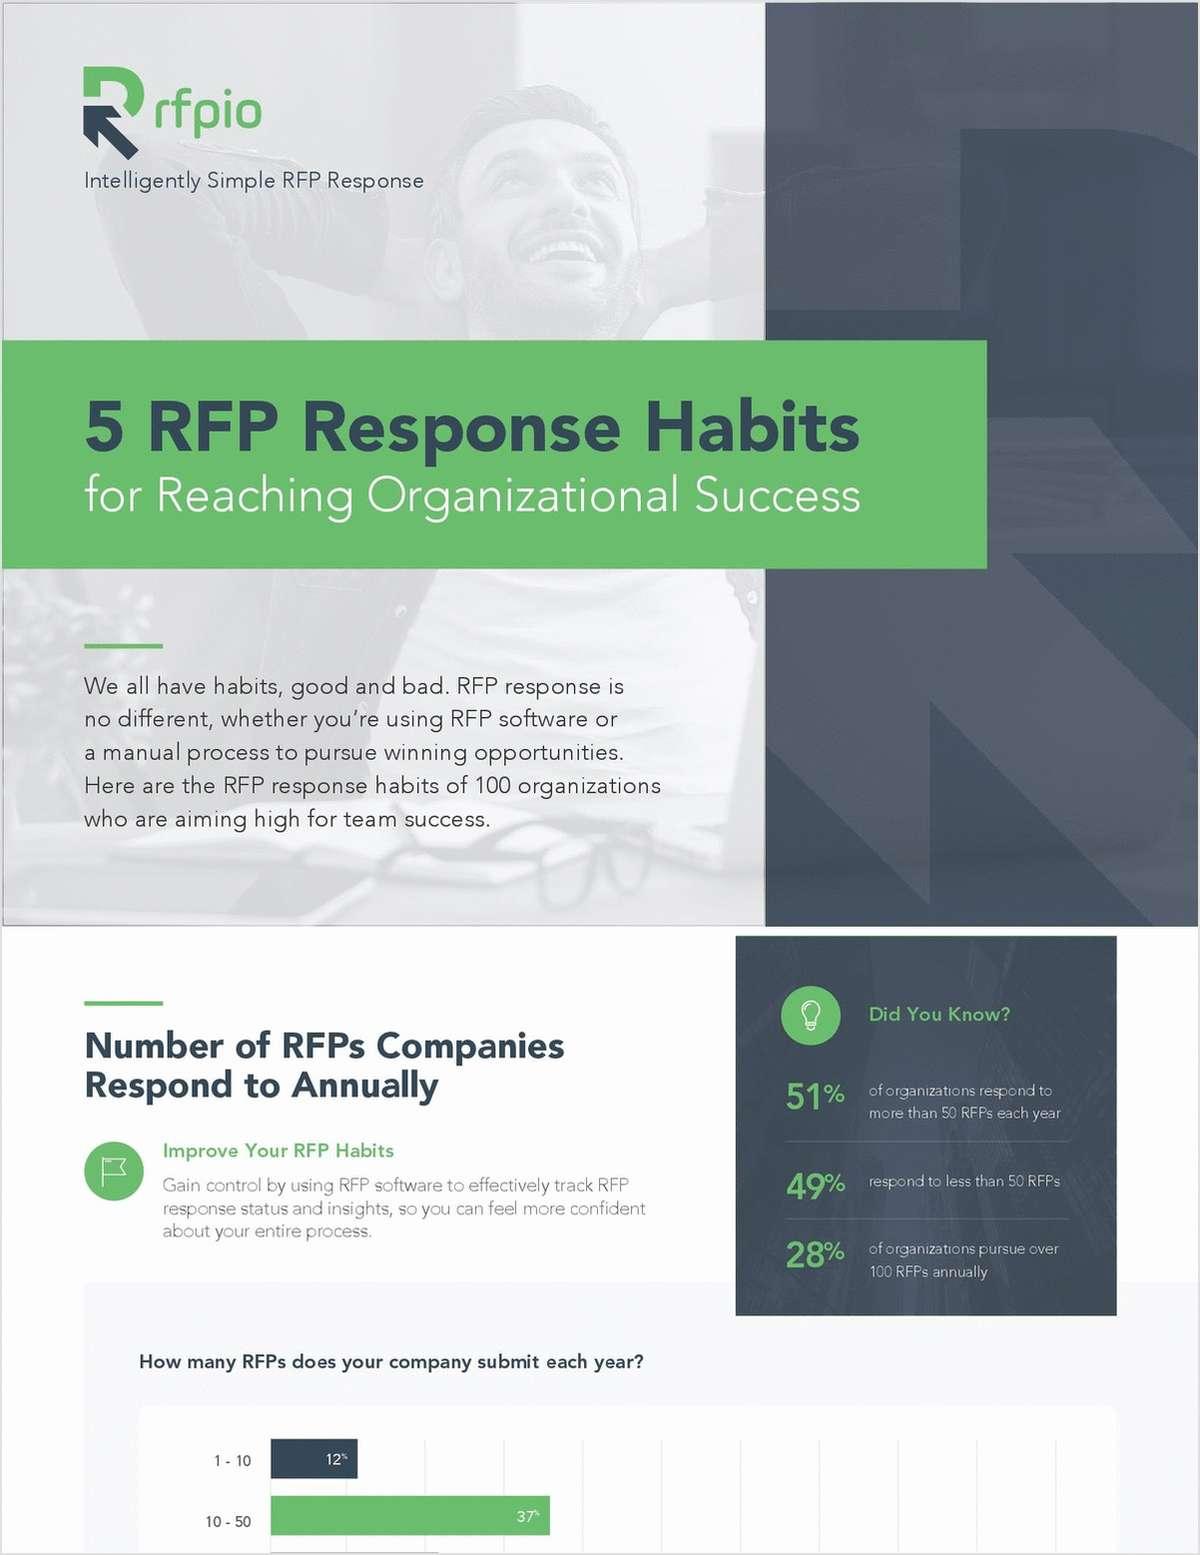 5 RFP Response Habits for Reaching Organizational Success